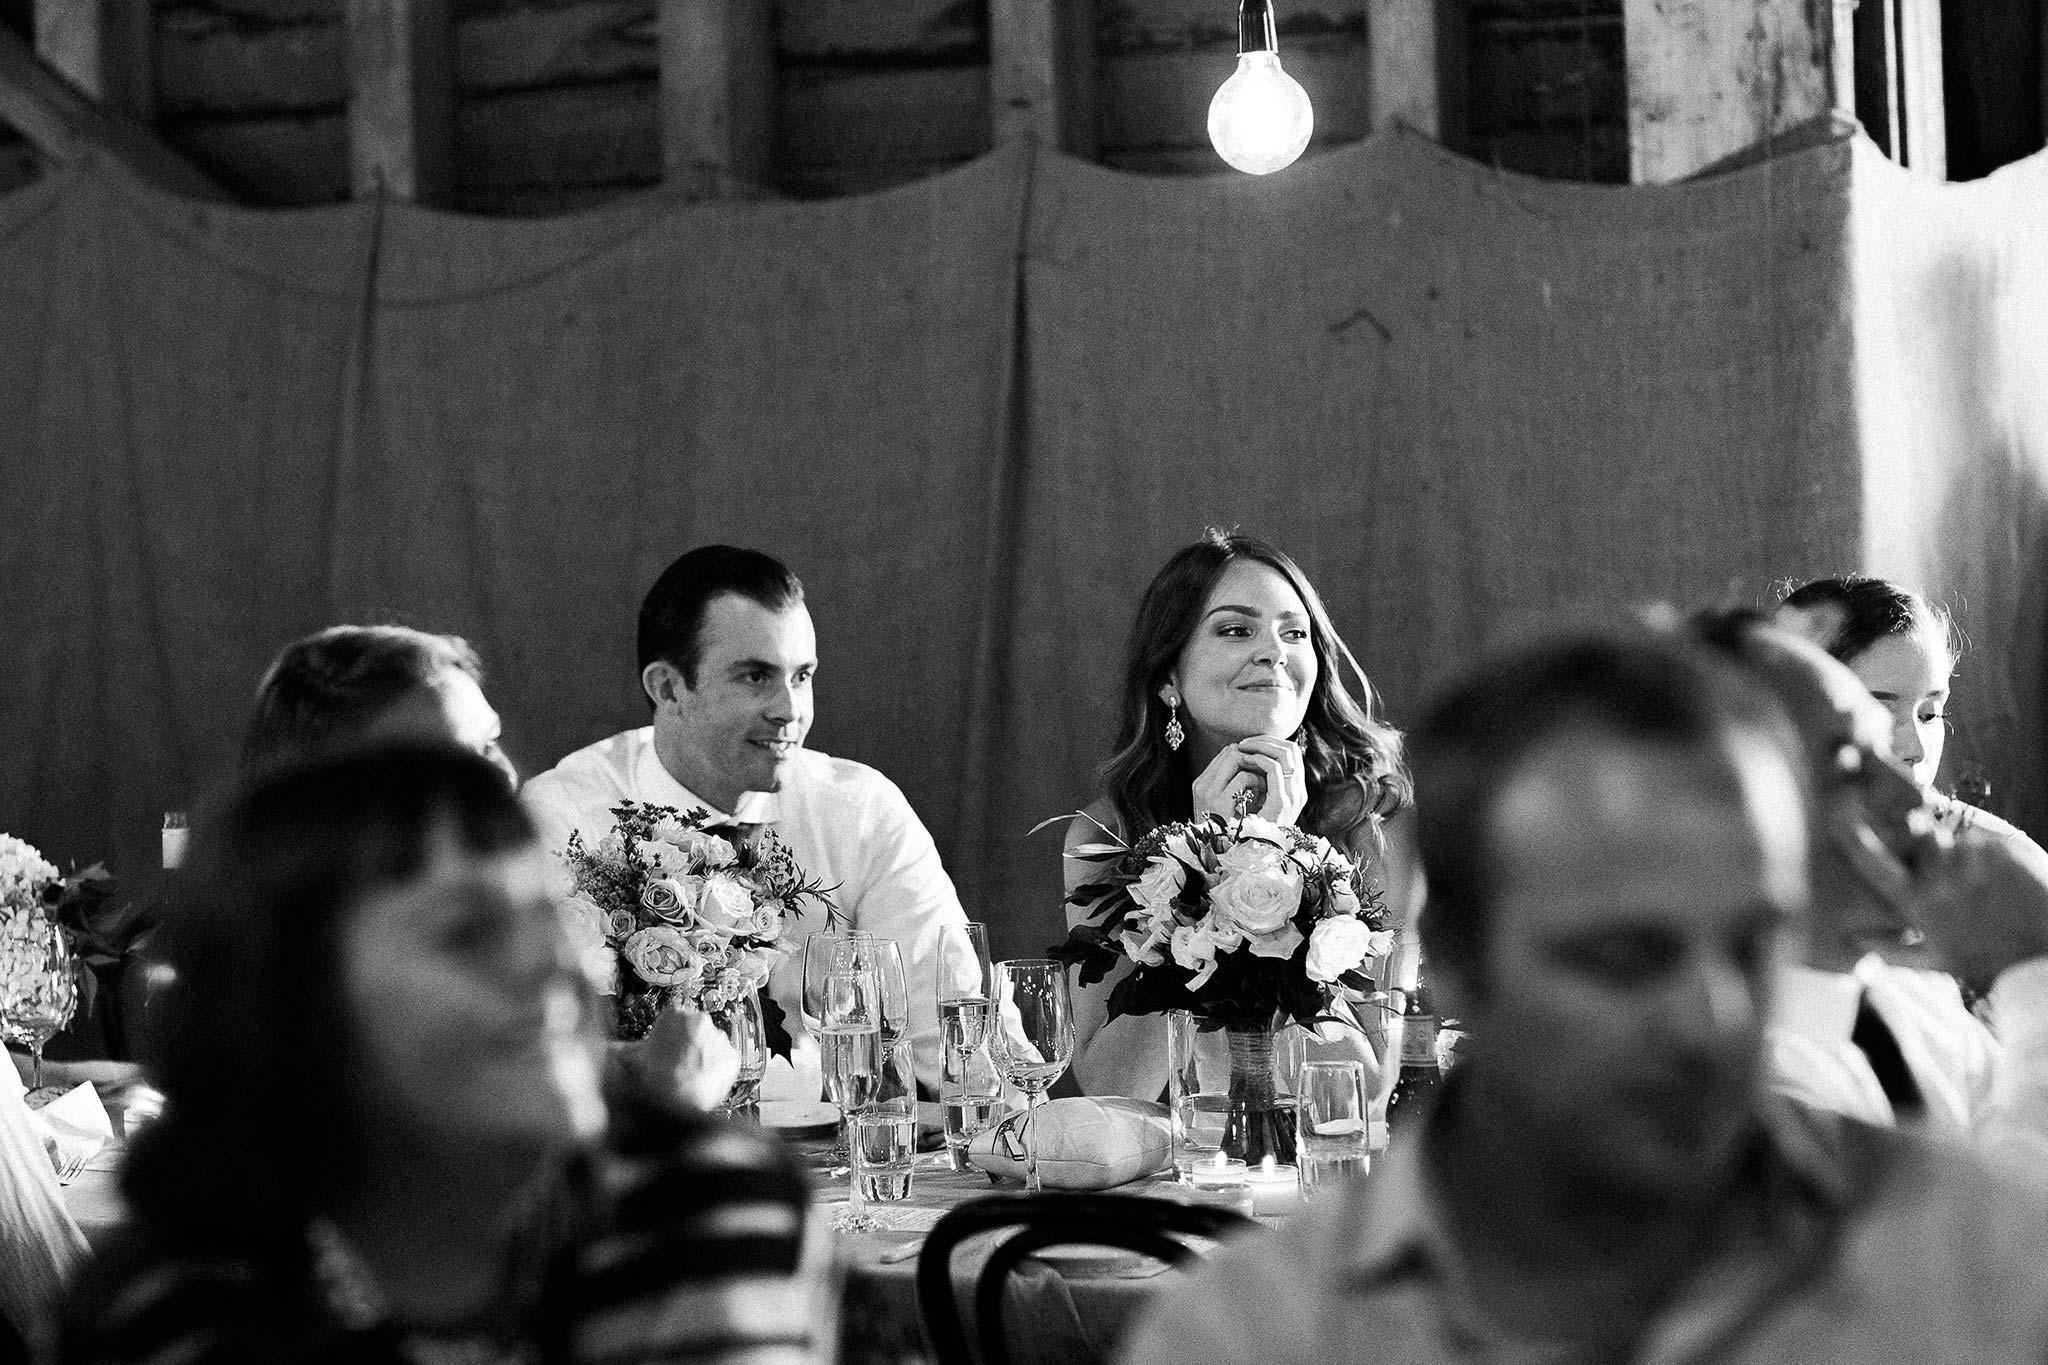 Launceston-Brickendon-barn-Wedding-Photographer-reception-bride-groom